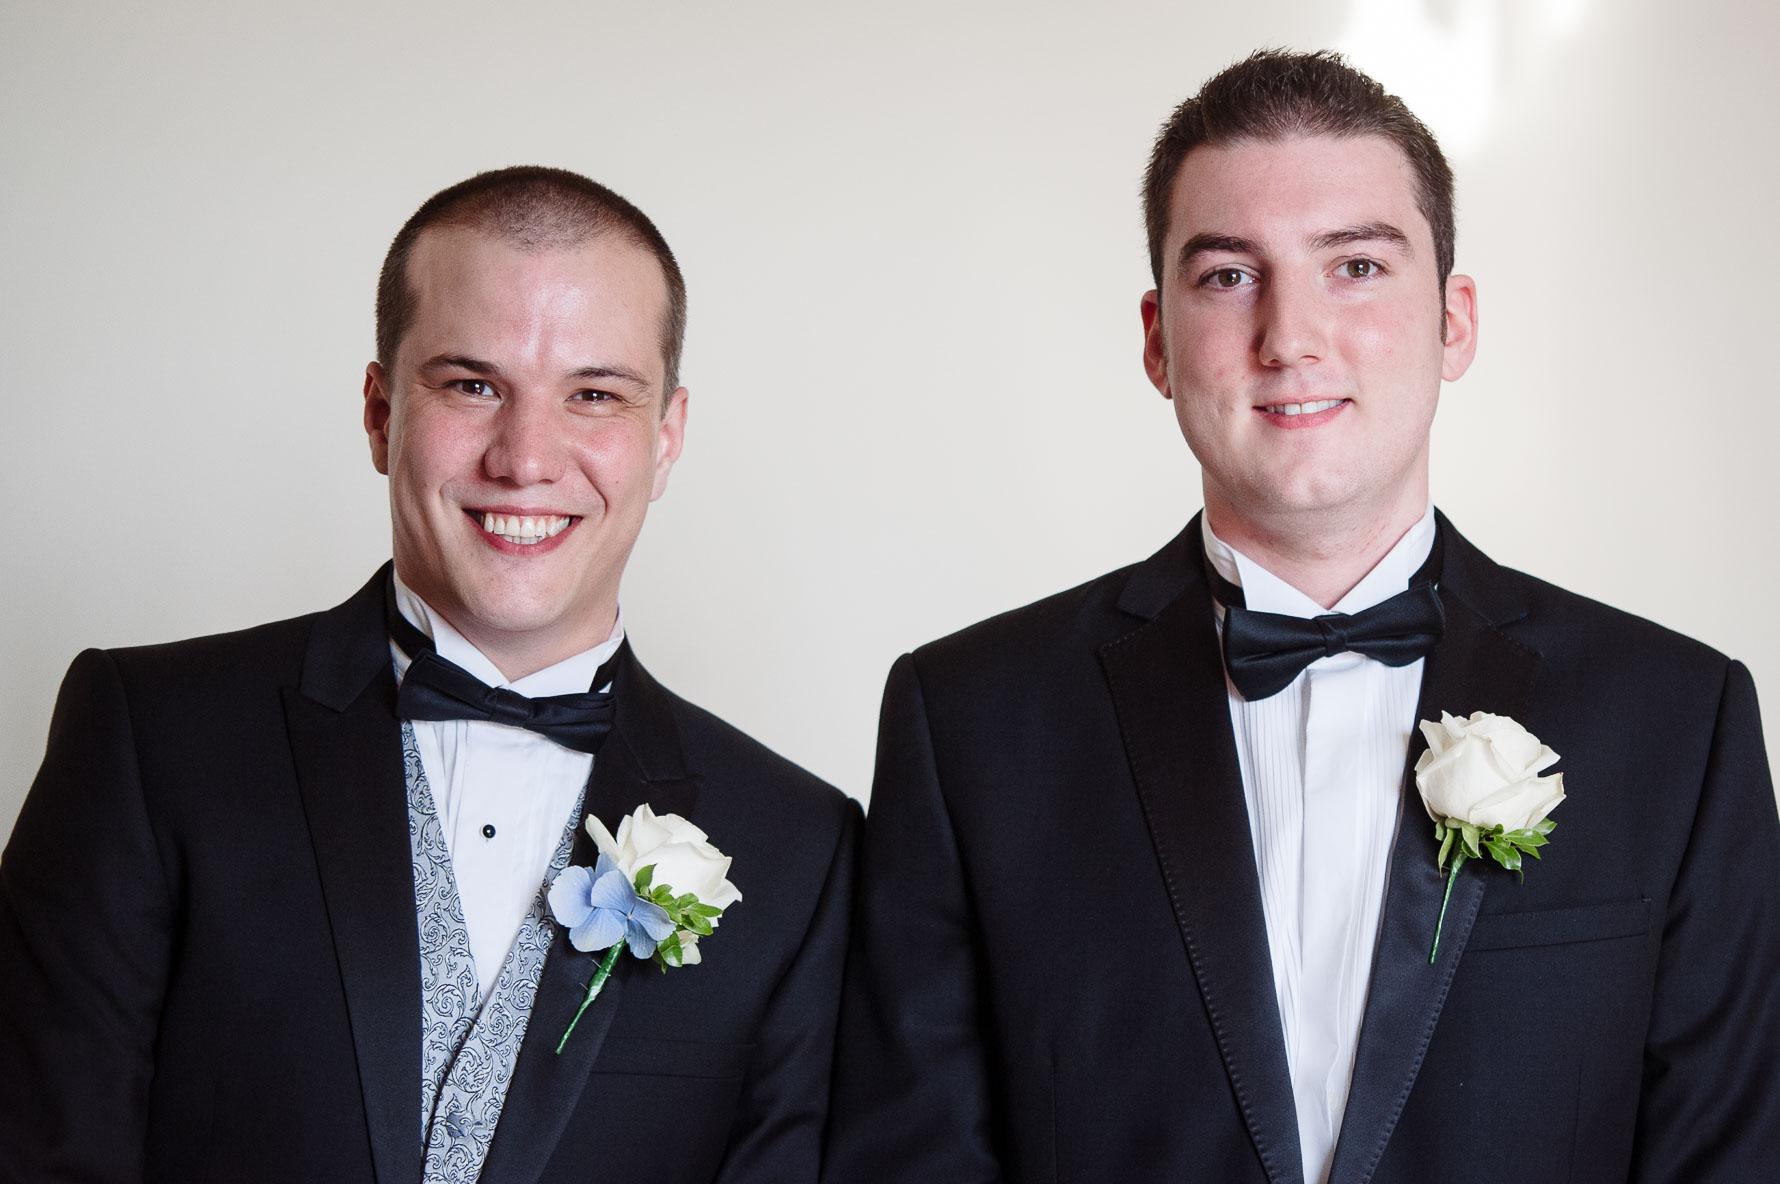 Leeds Castle Wedding5-20140919 0225